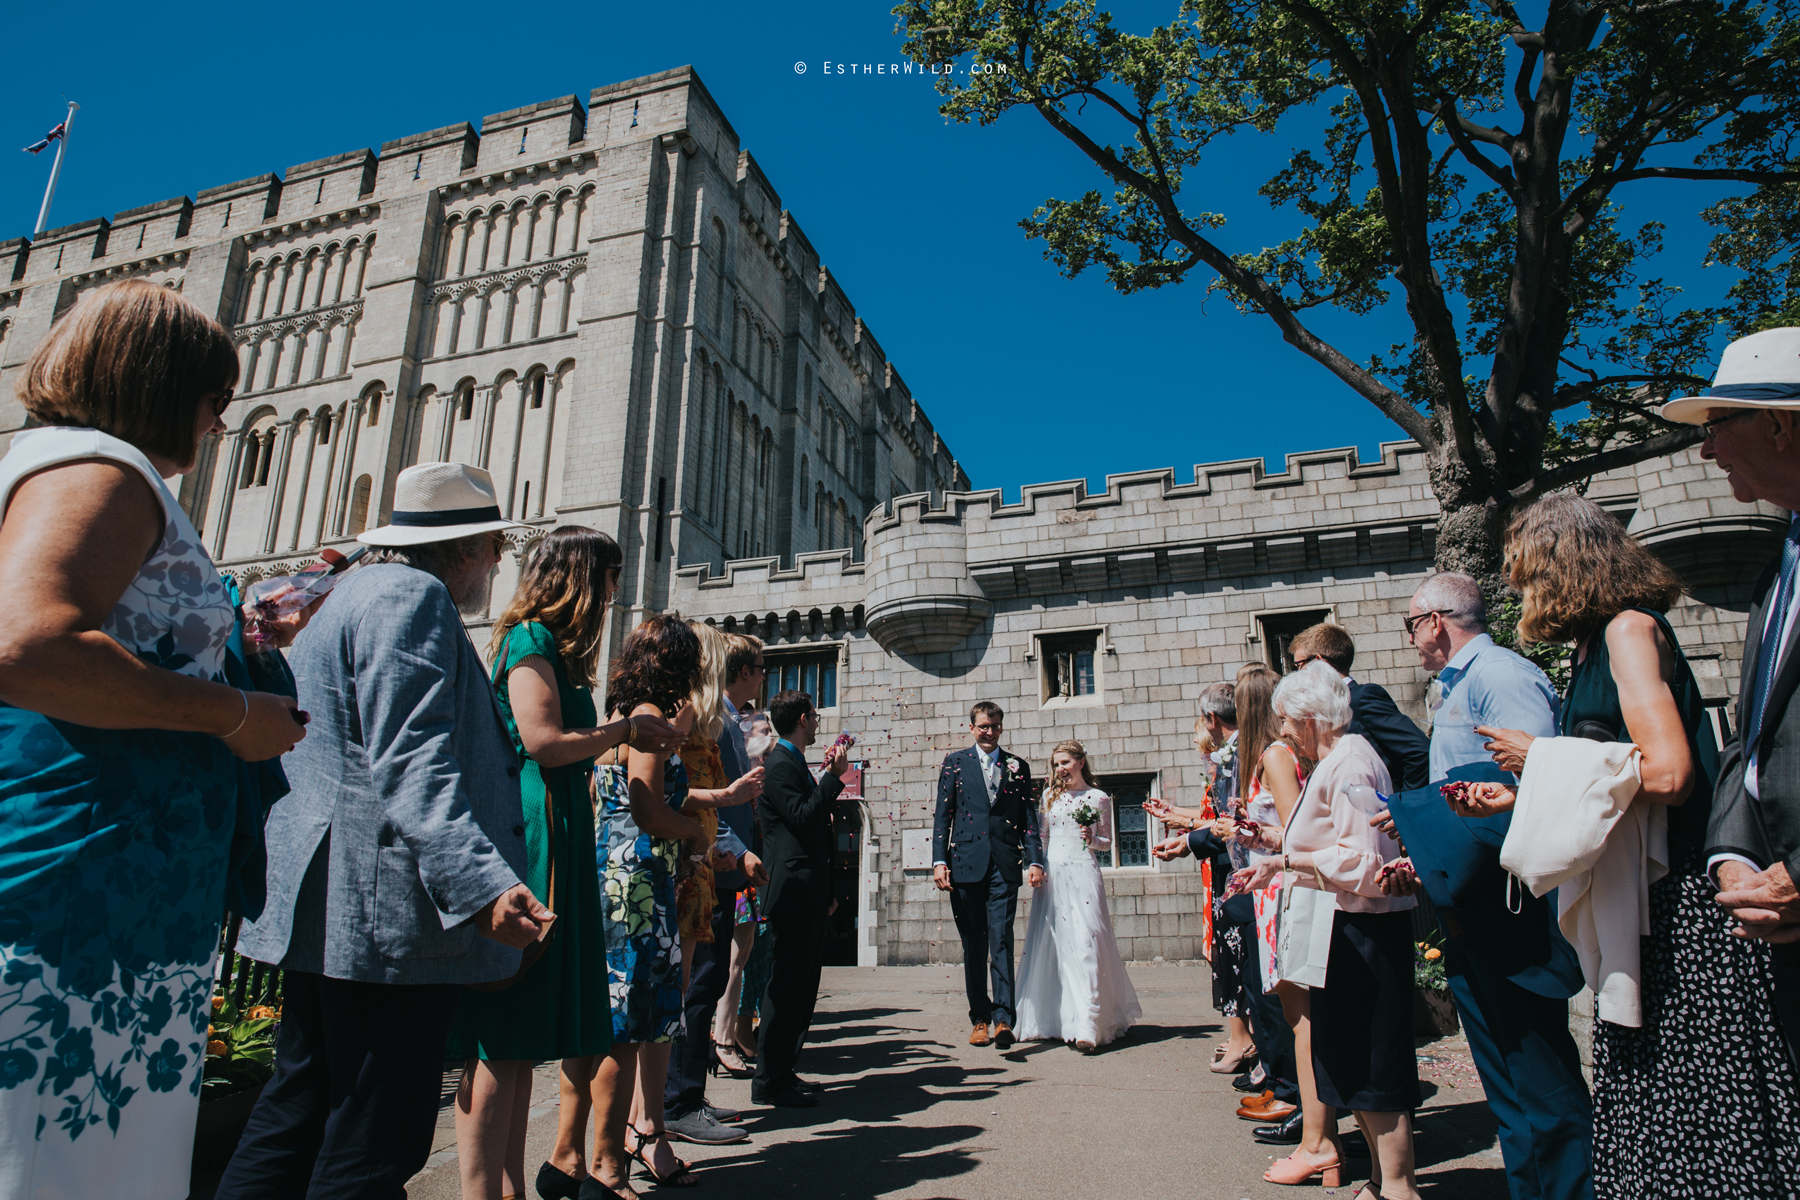 Norwich_Castle_Assembly_House_Norwich_Norfolk_Esther_Wild_Photographer_IMG_0680.jpg